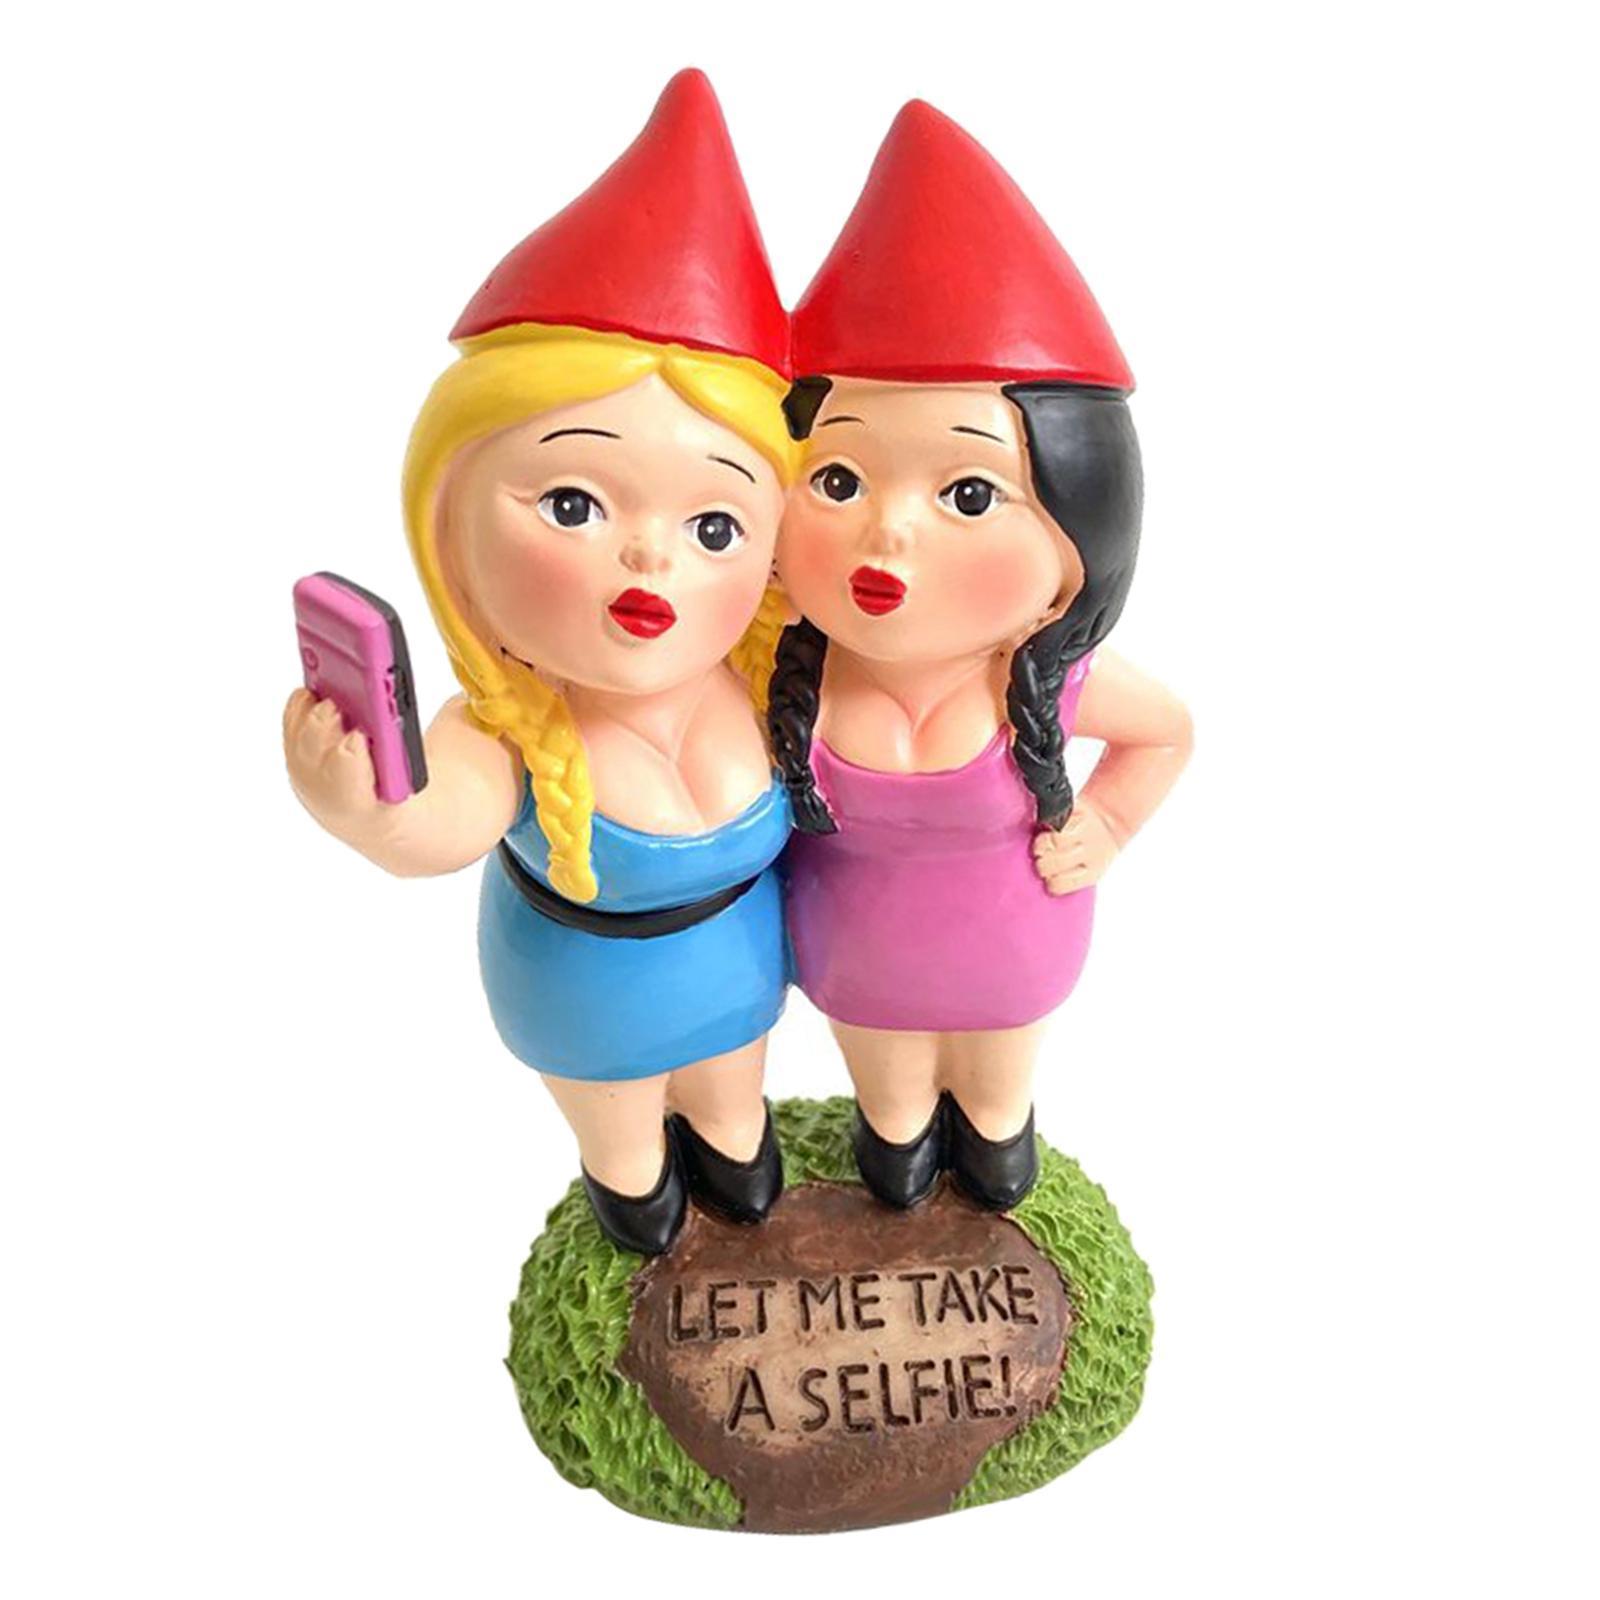 thumbnail 15 - Funny Resin Naughty Garden Gnome Statue Ornaments Outdoor Villa Home Figurines